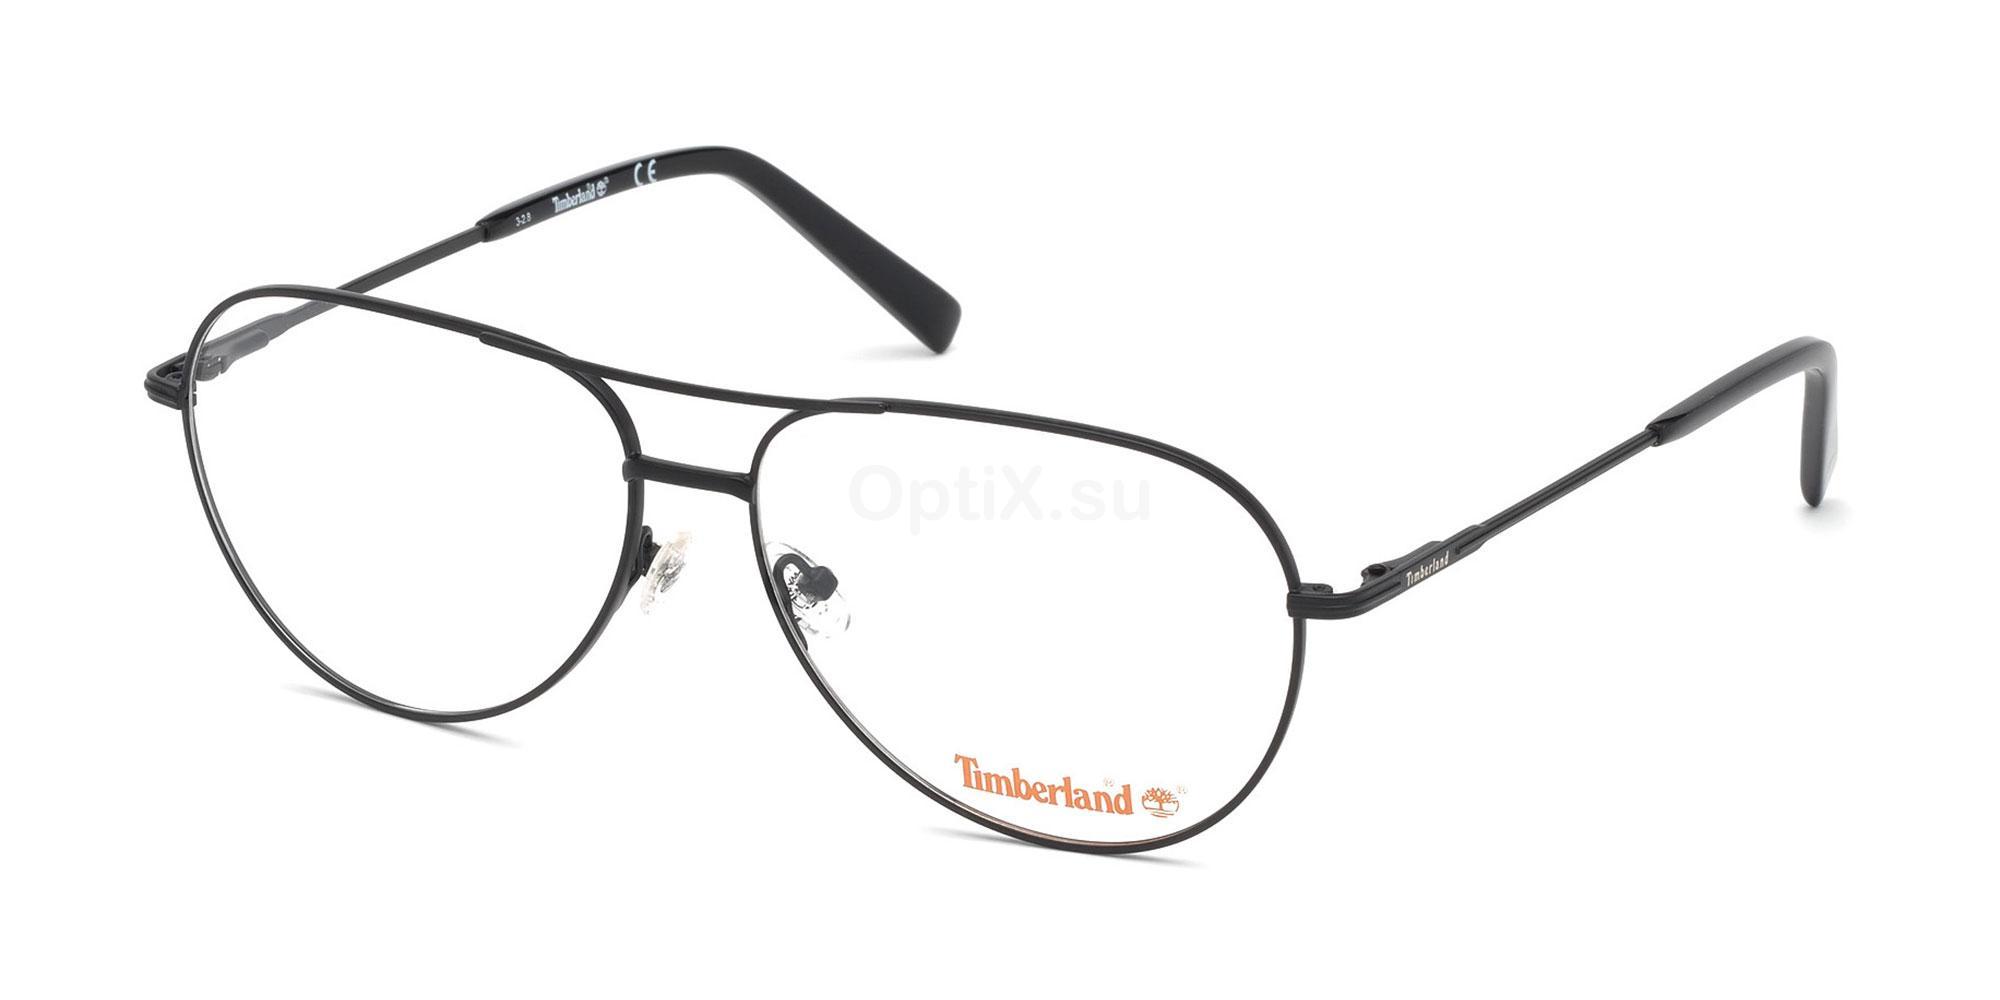 002 TB1630 Glasses, Timberland